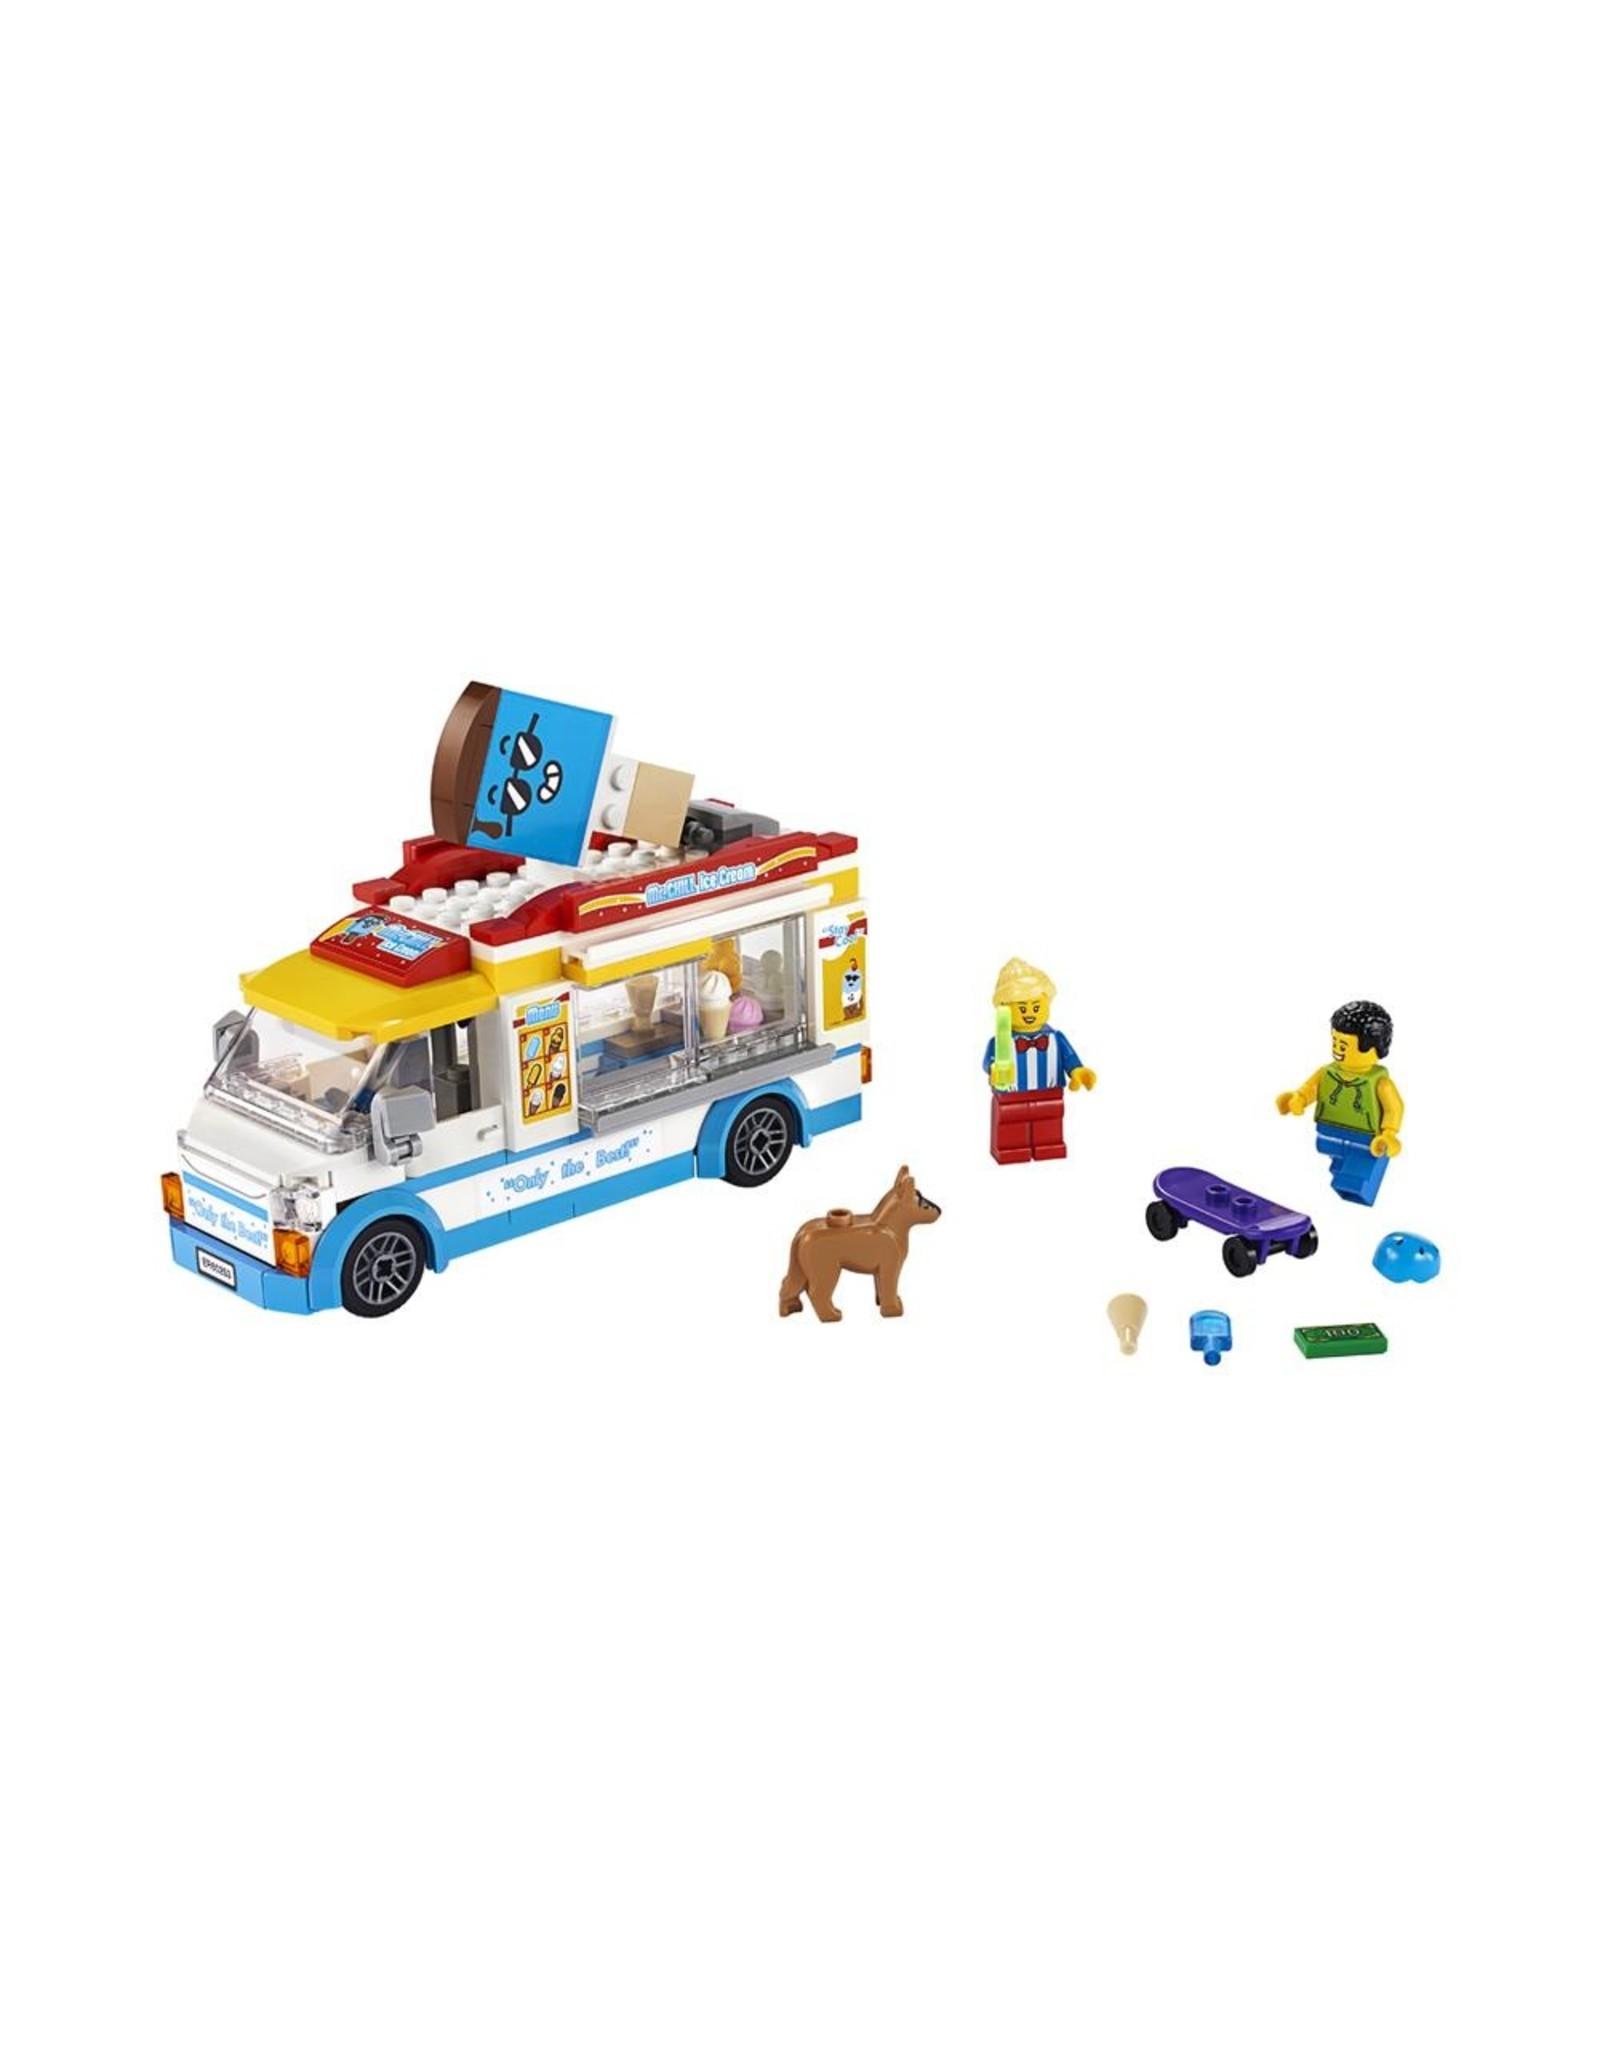 LEGO City Great Vehicles 60253 Ice-cream Truck